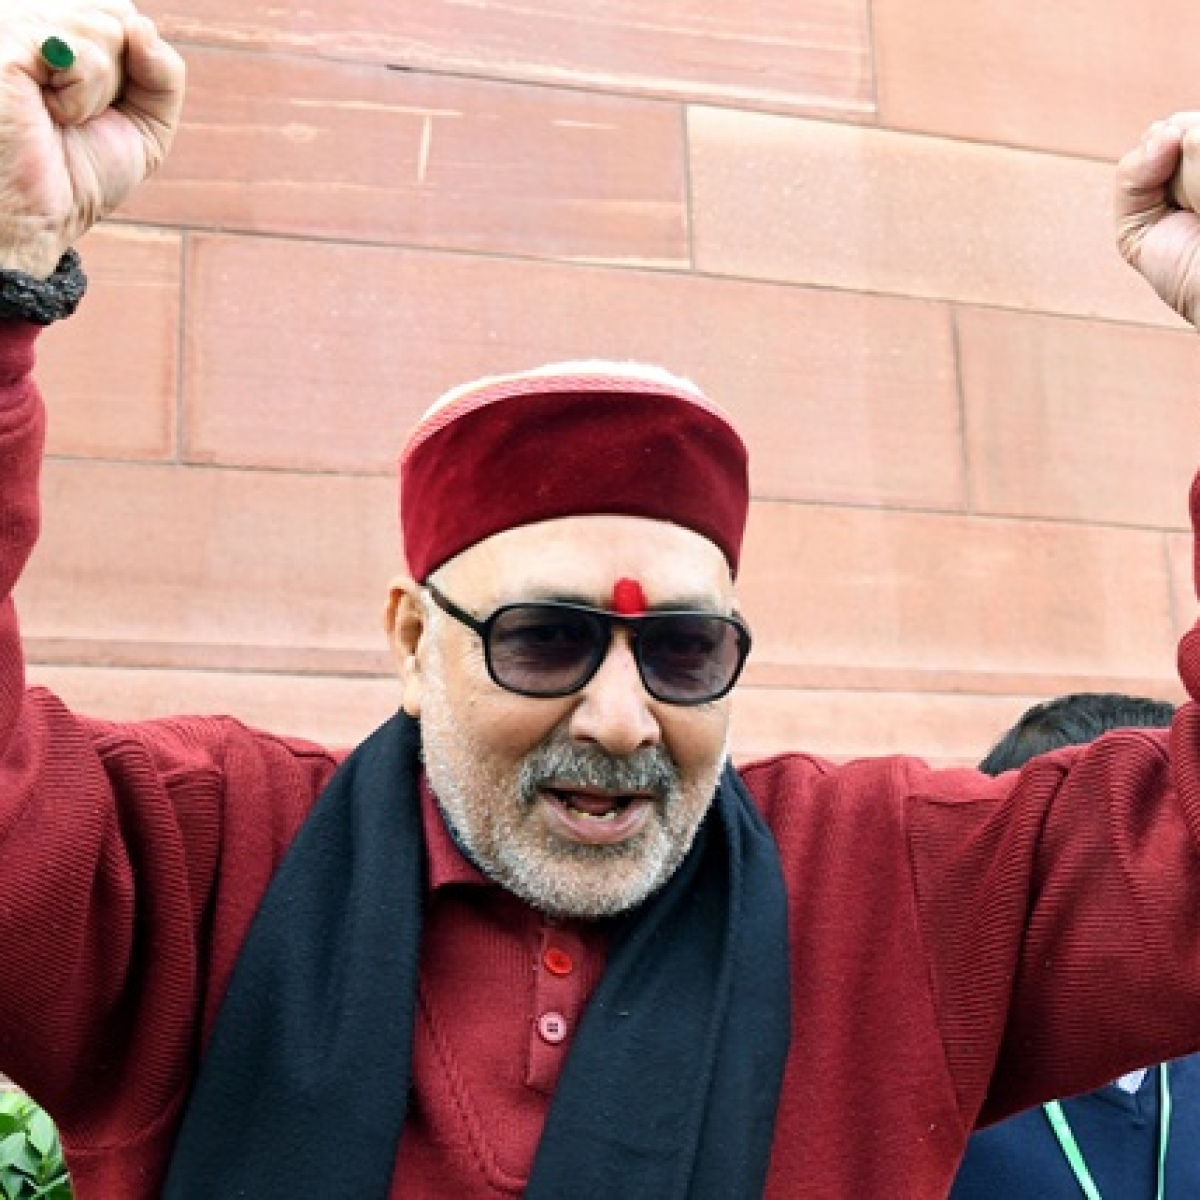 'Aatankvaad ki Gangotri': Giriraj Singh accuses Islamic seminary of producing terrorists 'including Hafiz Saeed'